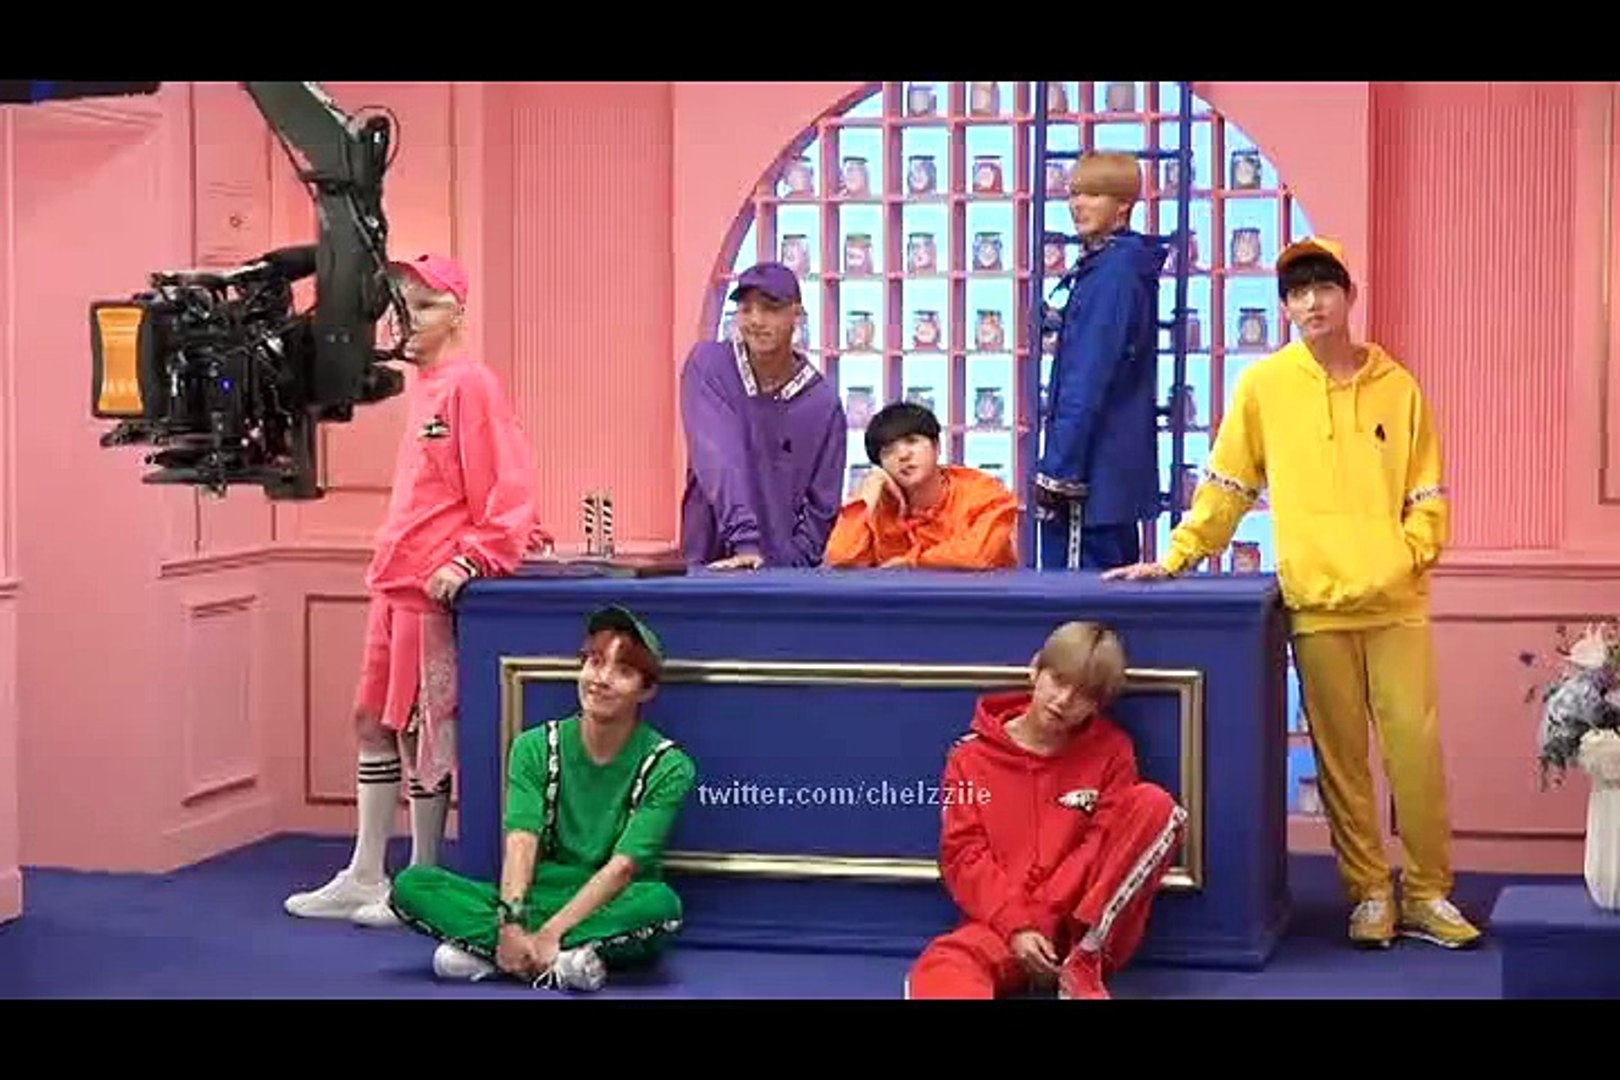 [ENGSUB] BTS 4th MUSTER - VCR Shooting Making - video dailymotion